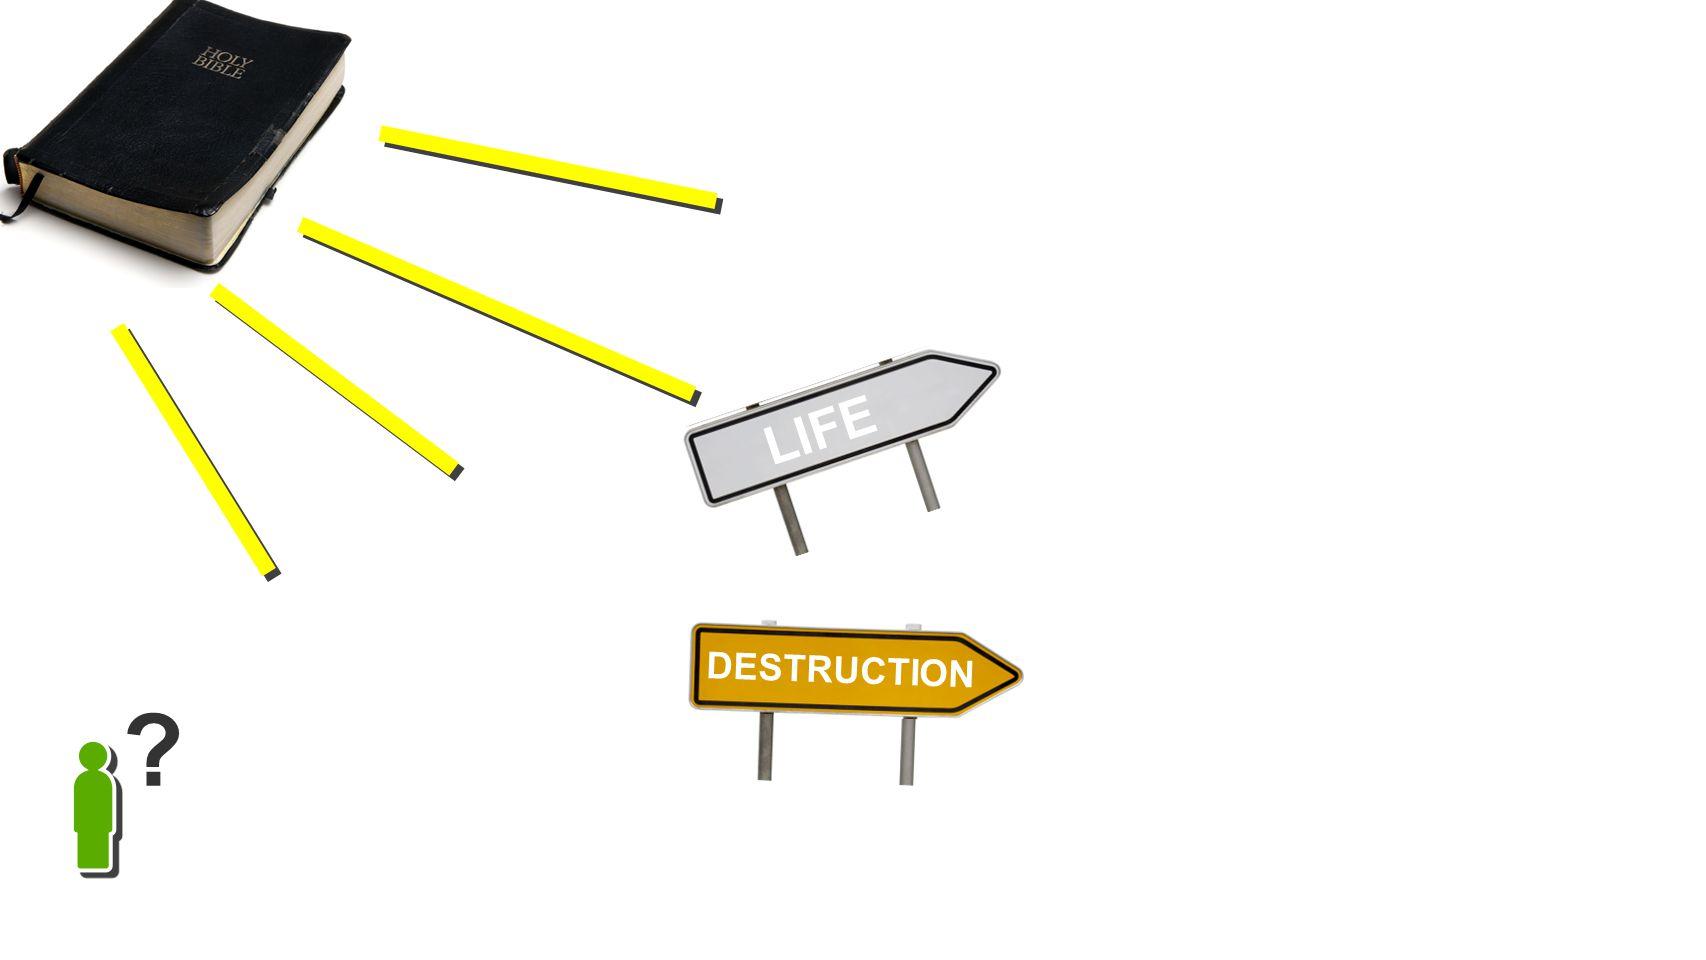 LIFE DESTRUCTION